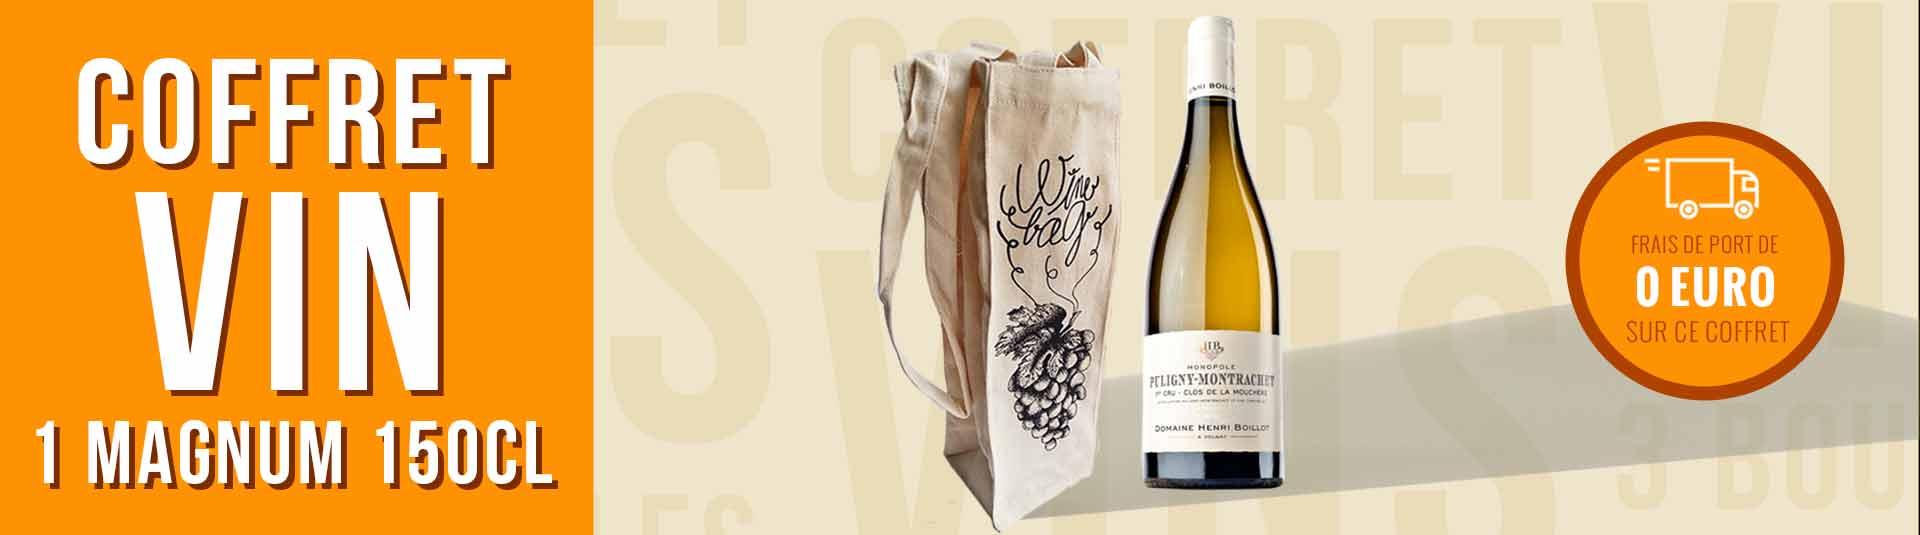 Coffret Magnum Bourgogne Blanc Puligny-Montrachet 1er Cru